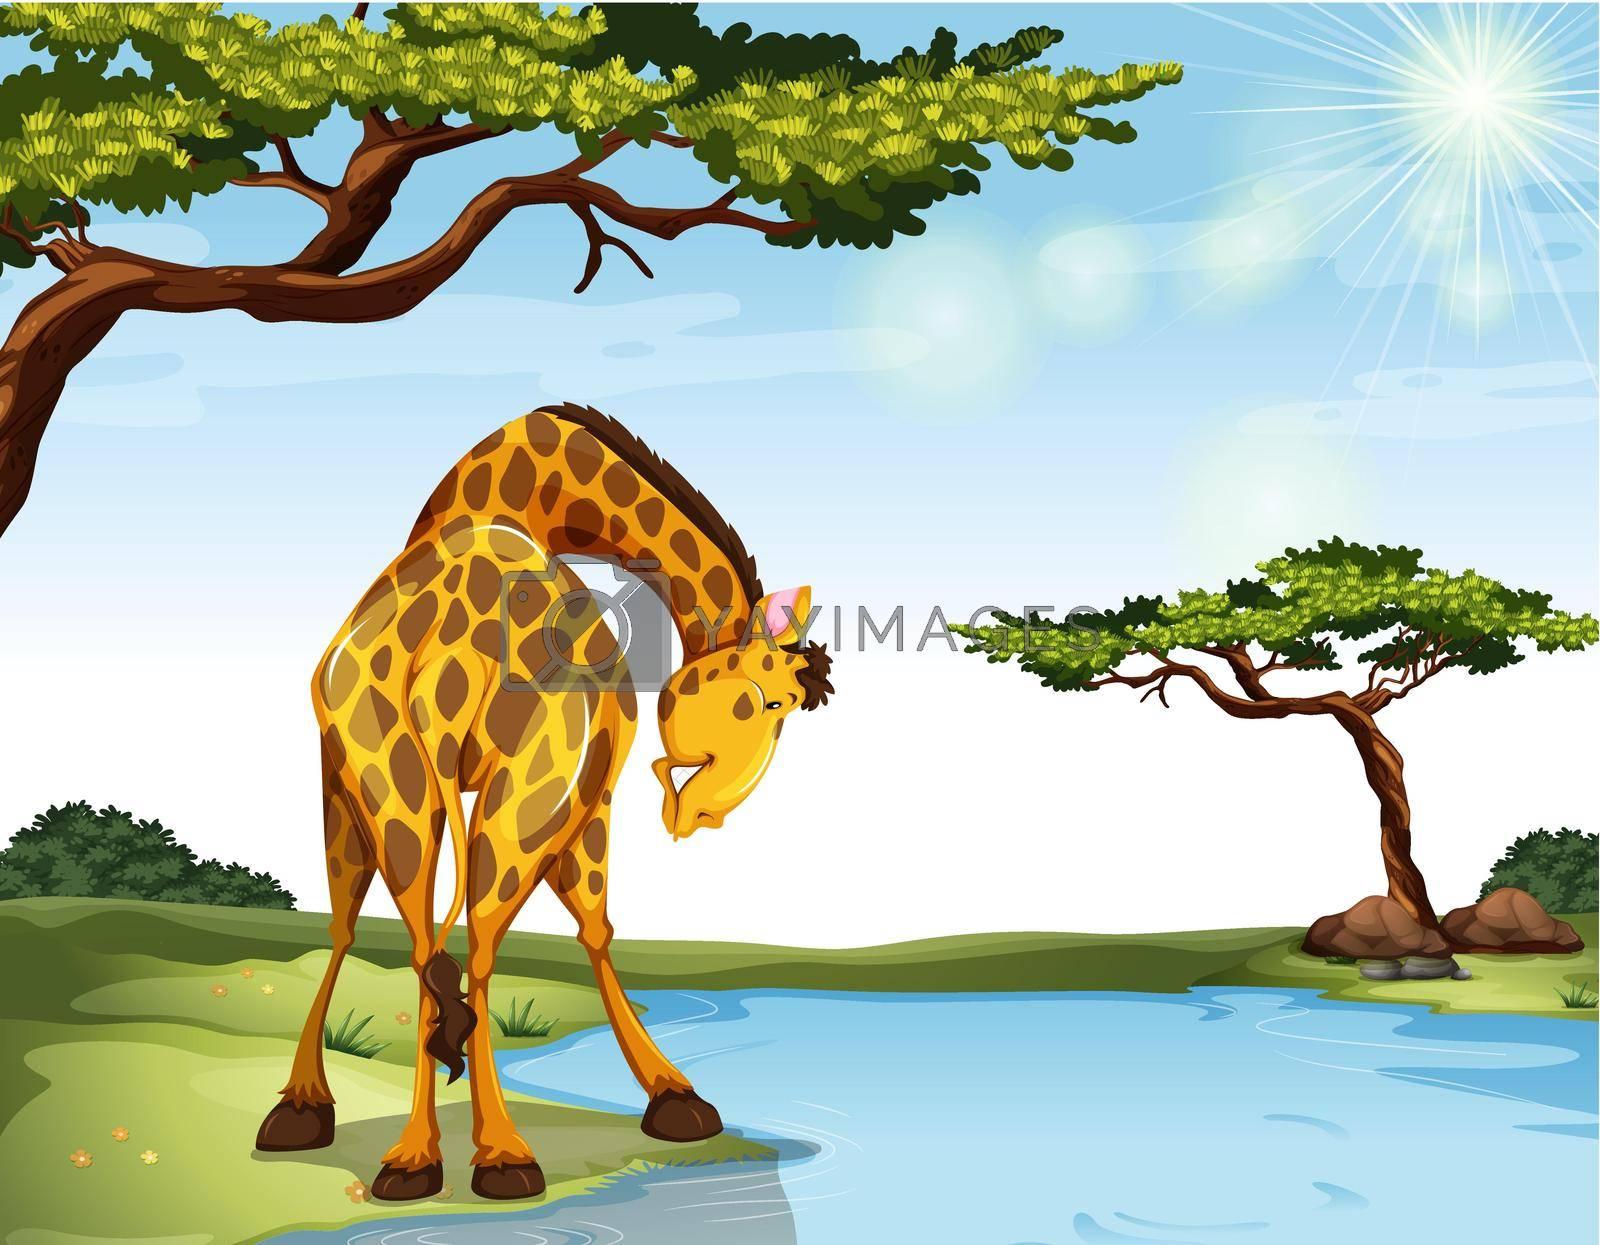 Royalty free image of Giraffe by iimages